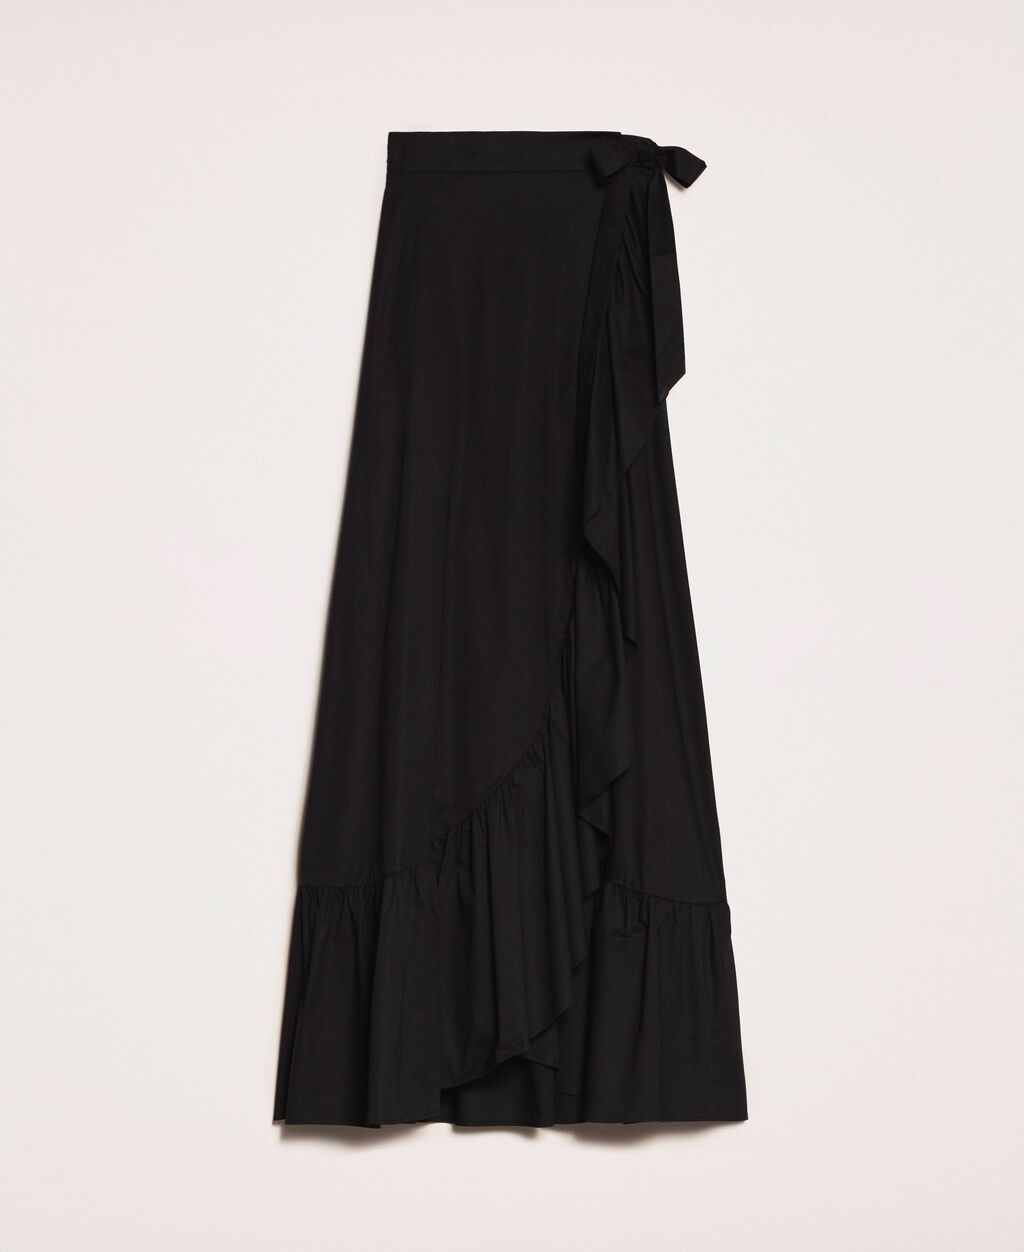 Long poplin skirt with ruffles